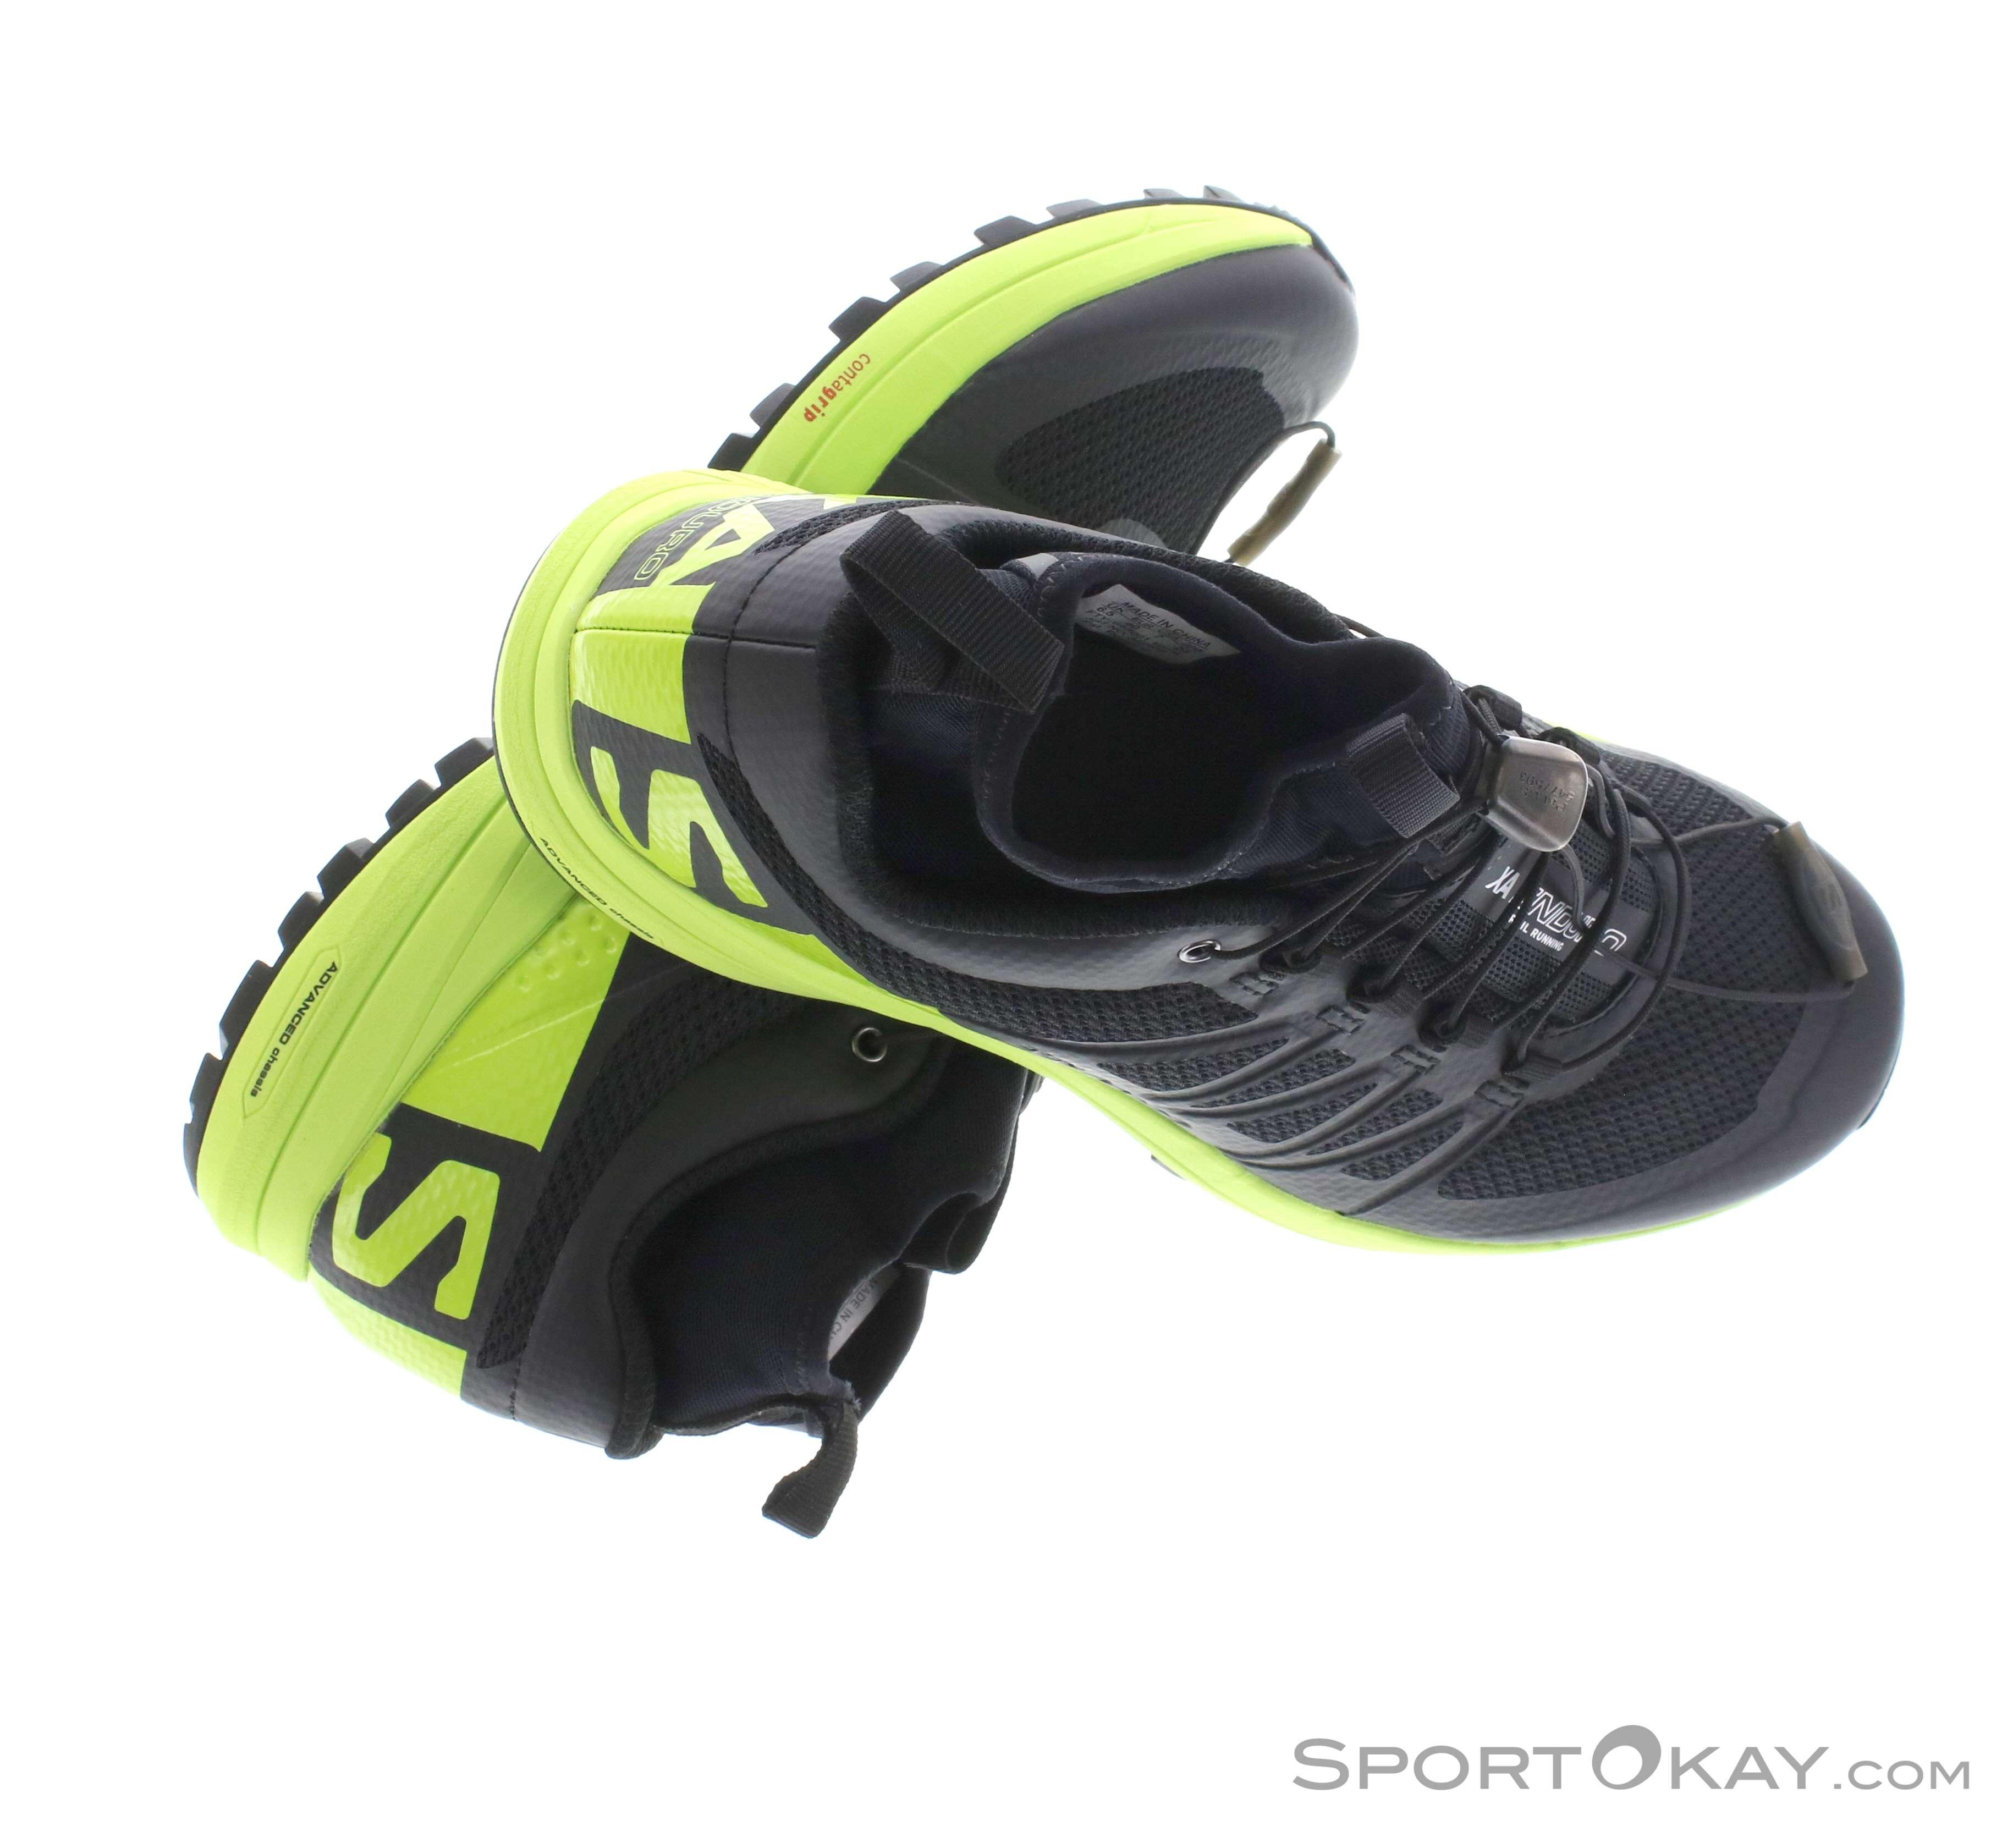 Scarpe Running Enduro Trail Da Uomo Xa Salomon qzw7vt7 be41d4d33b2